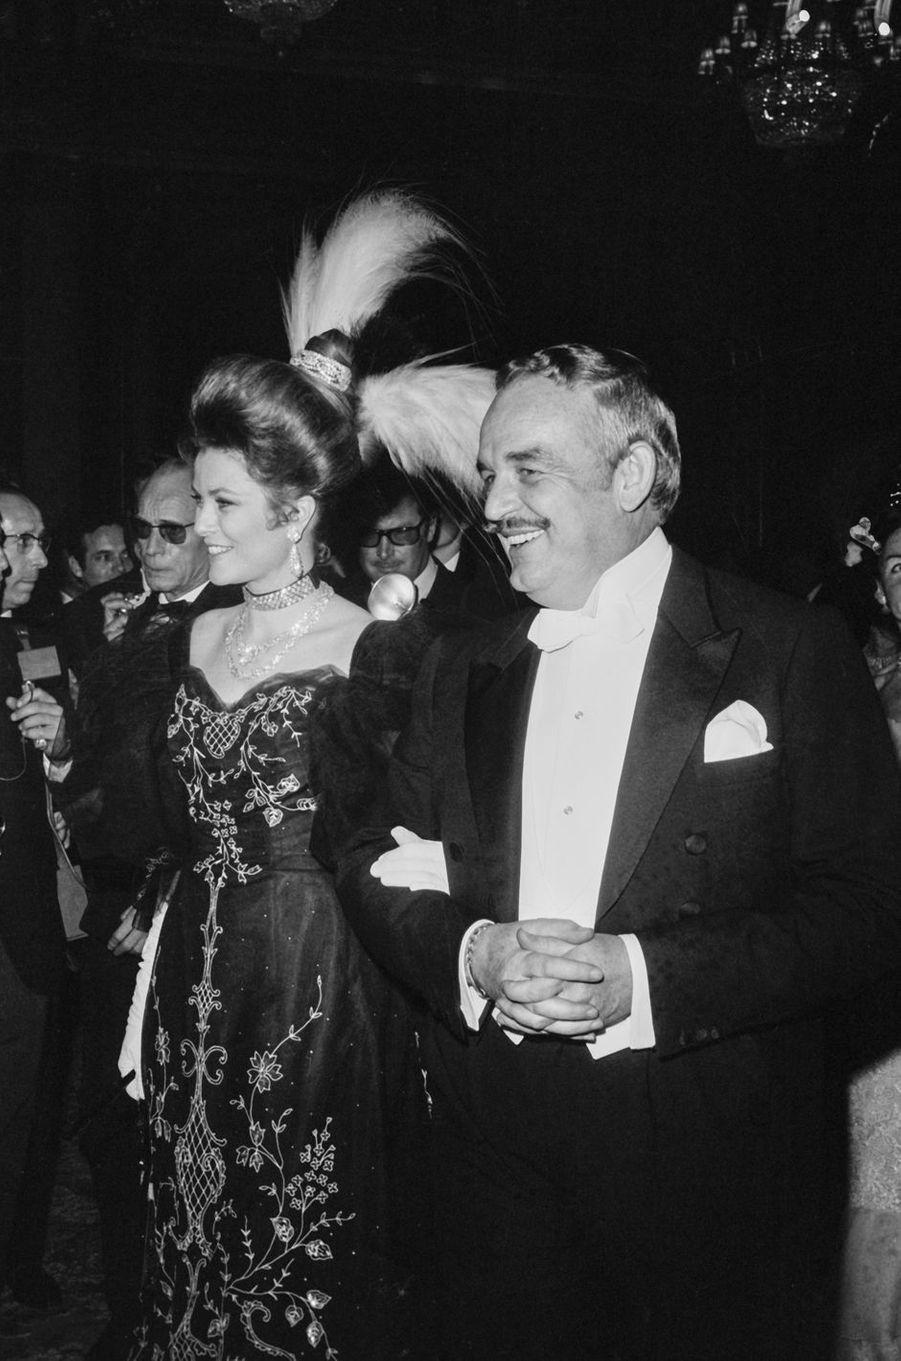 La princesse Grace et le prince Rainier III de Monaco, le 17 mars 1968